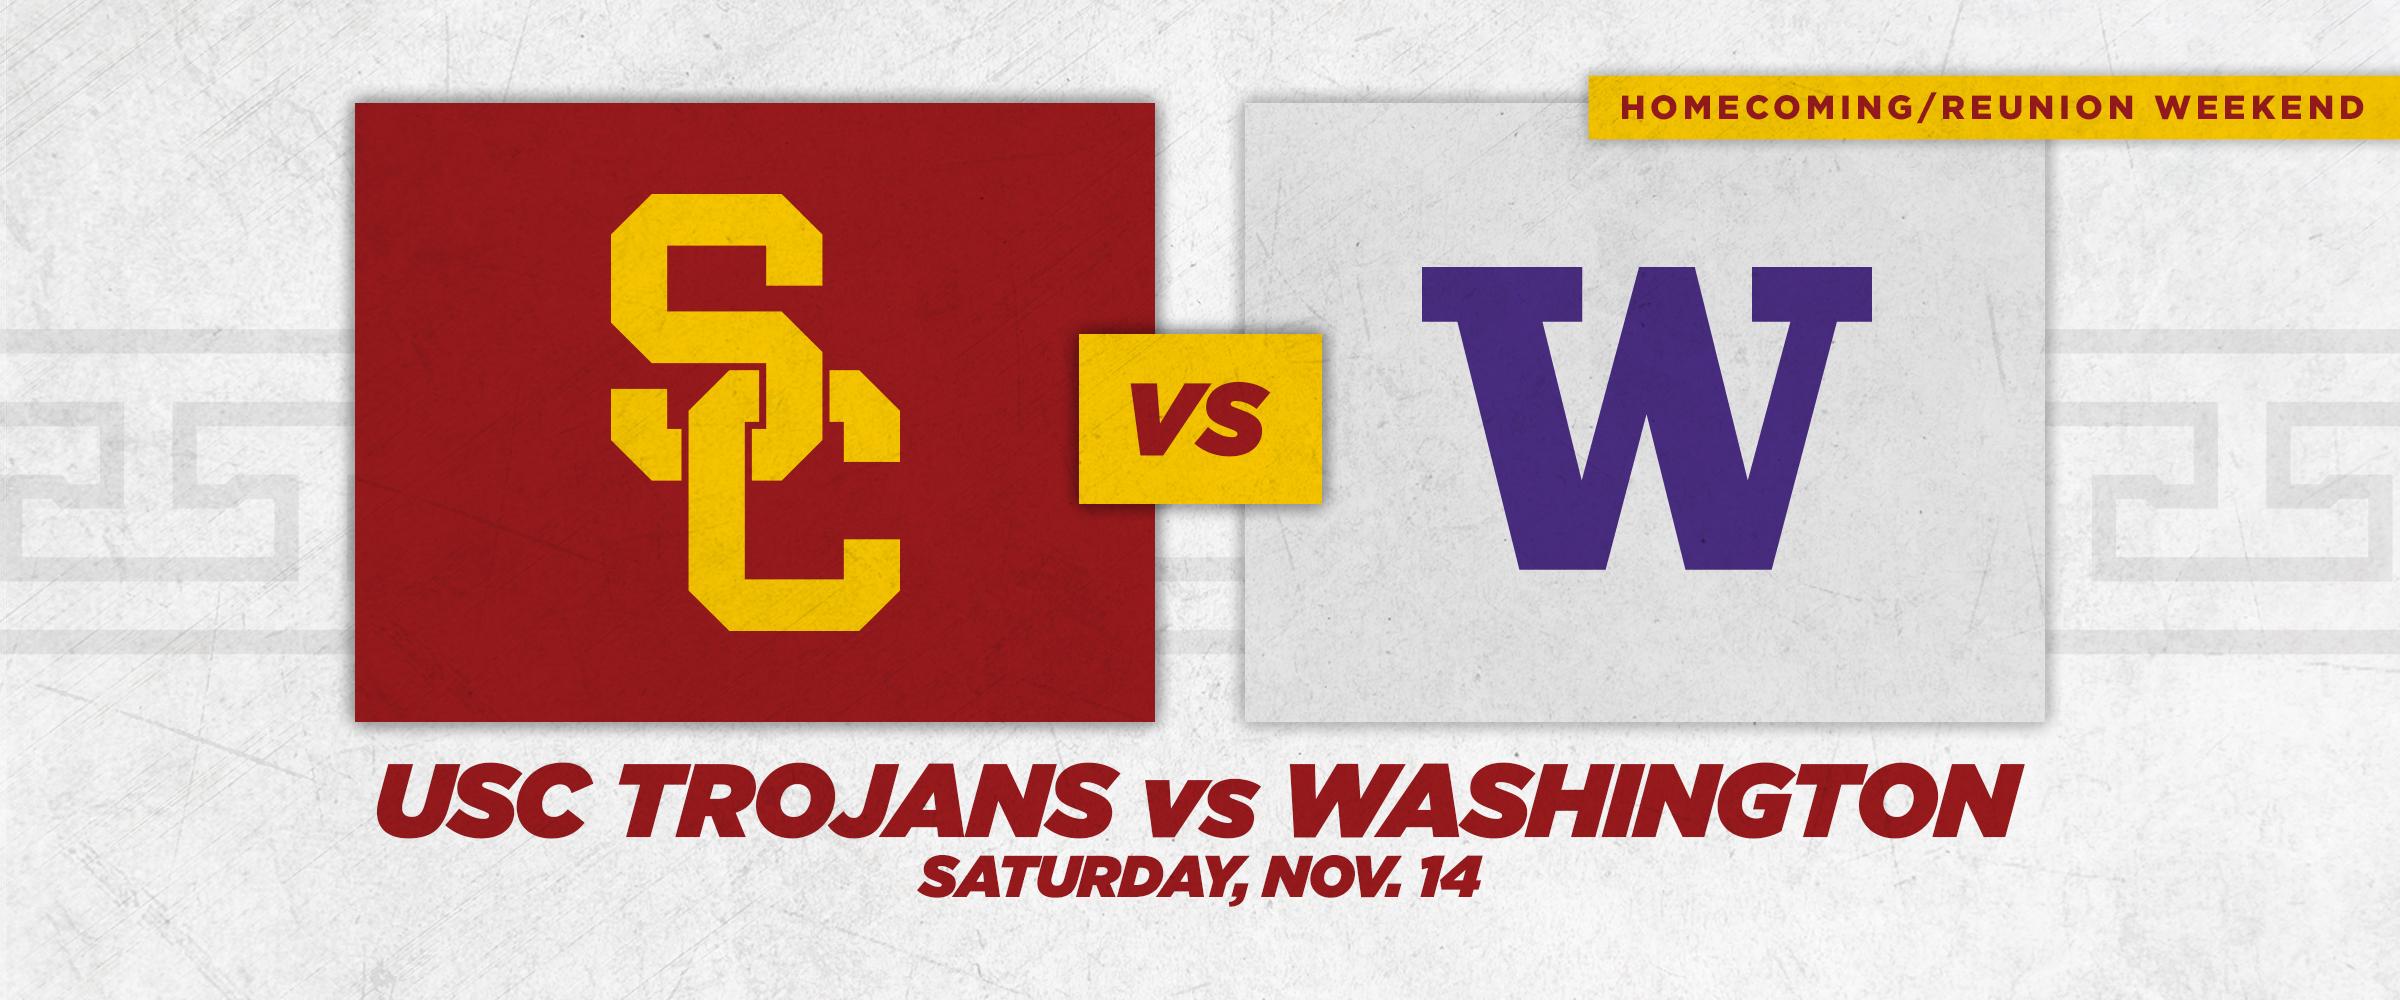 USC vs WASHINGTON